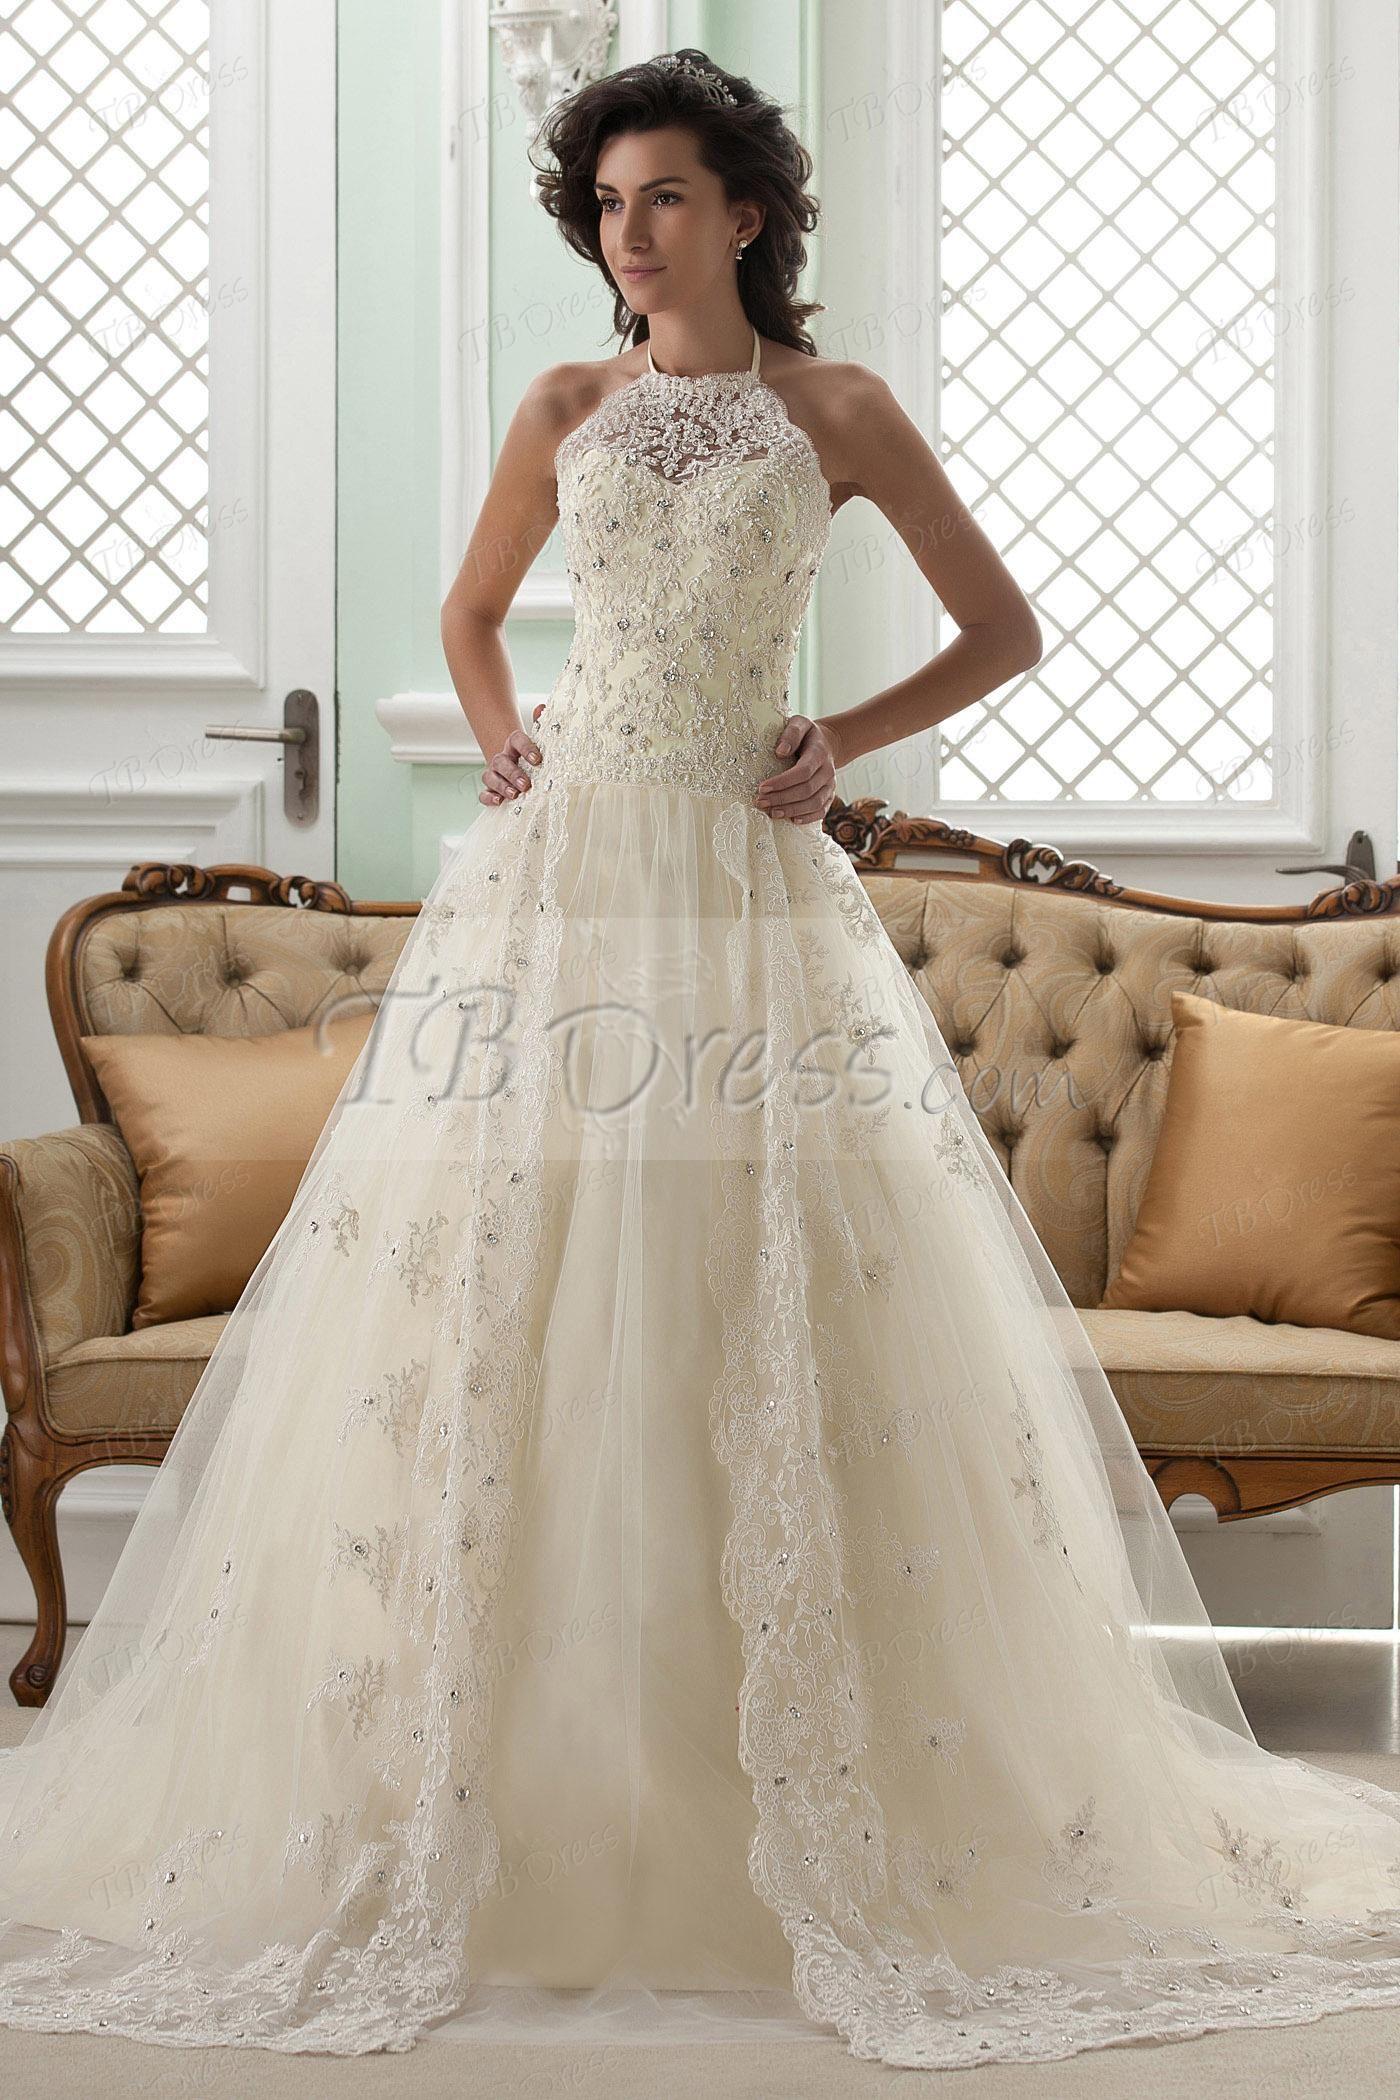 Lace wedding dress halter  Halter Neck Appliques Beading Wedding Dress  Color wedding dresses